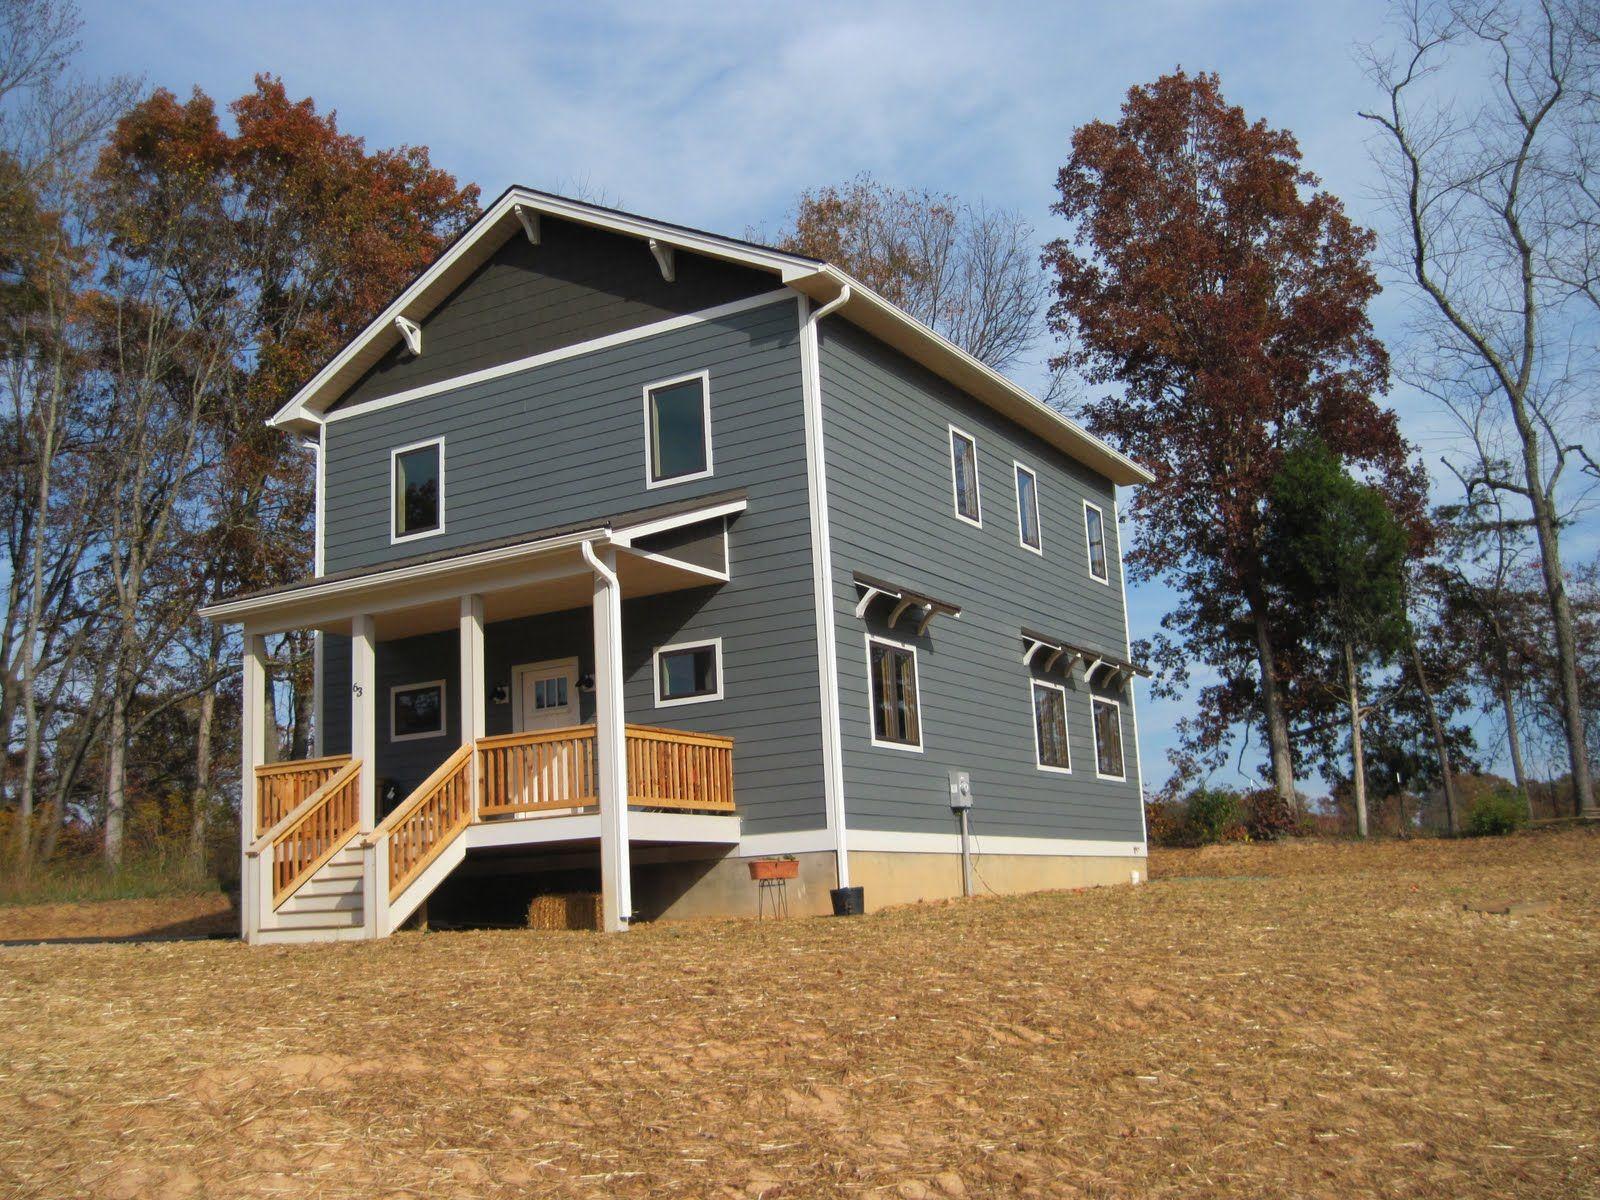 Affordable Green Home - 5ba7c5c1ac068348d5a026ba7c1e4949_Beautiful Affordable Green Home - 5ba7c5c1ac068348d5a026ba7c1e4949  Snapshot_82554.jpg